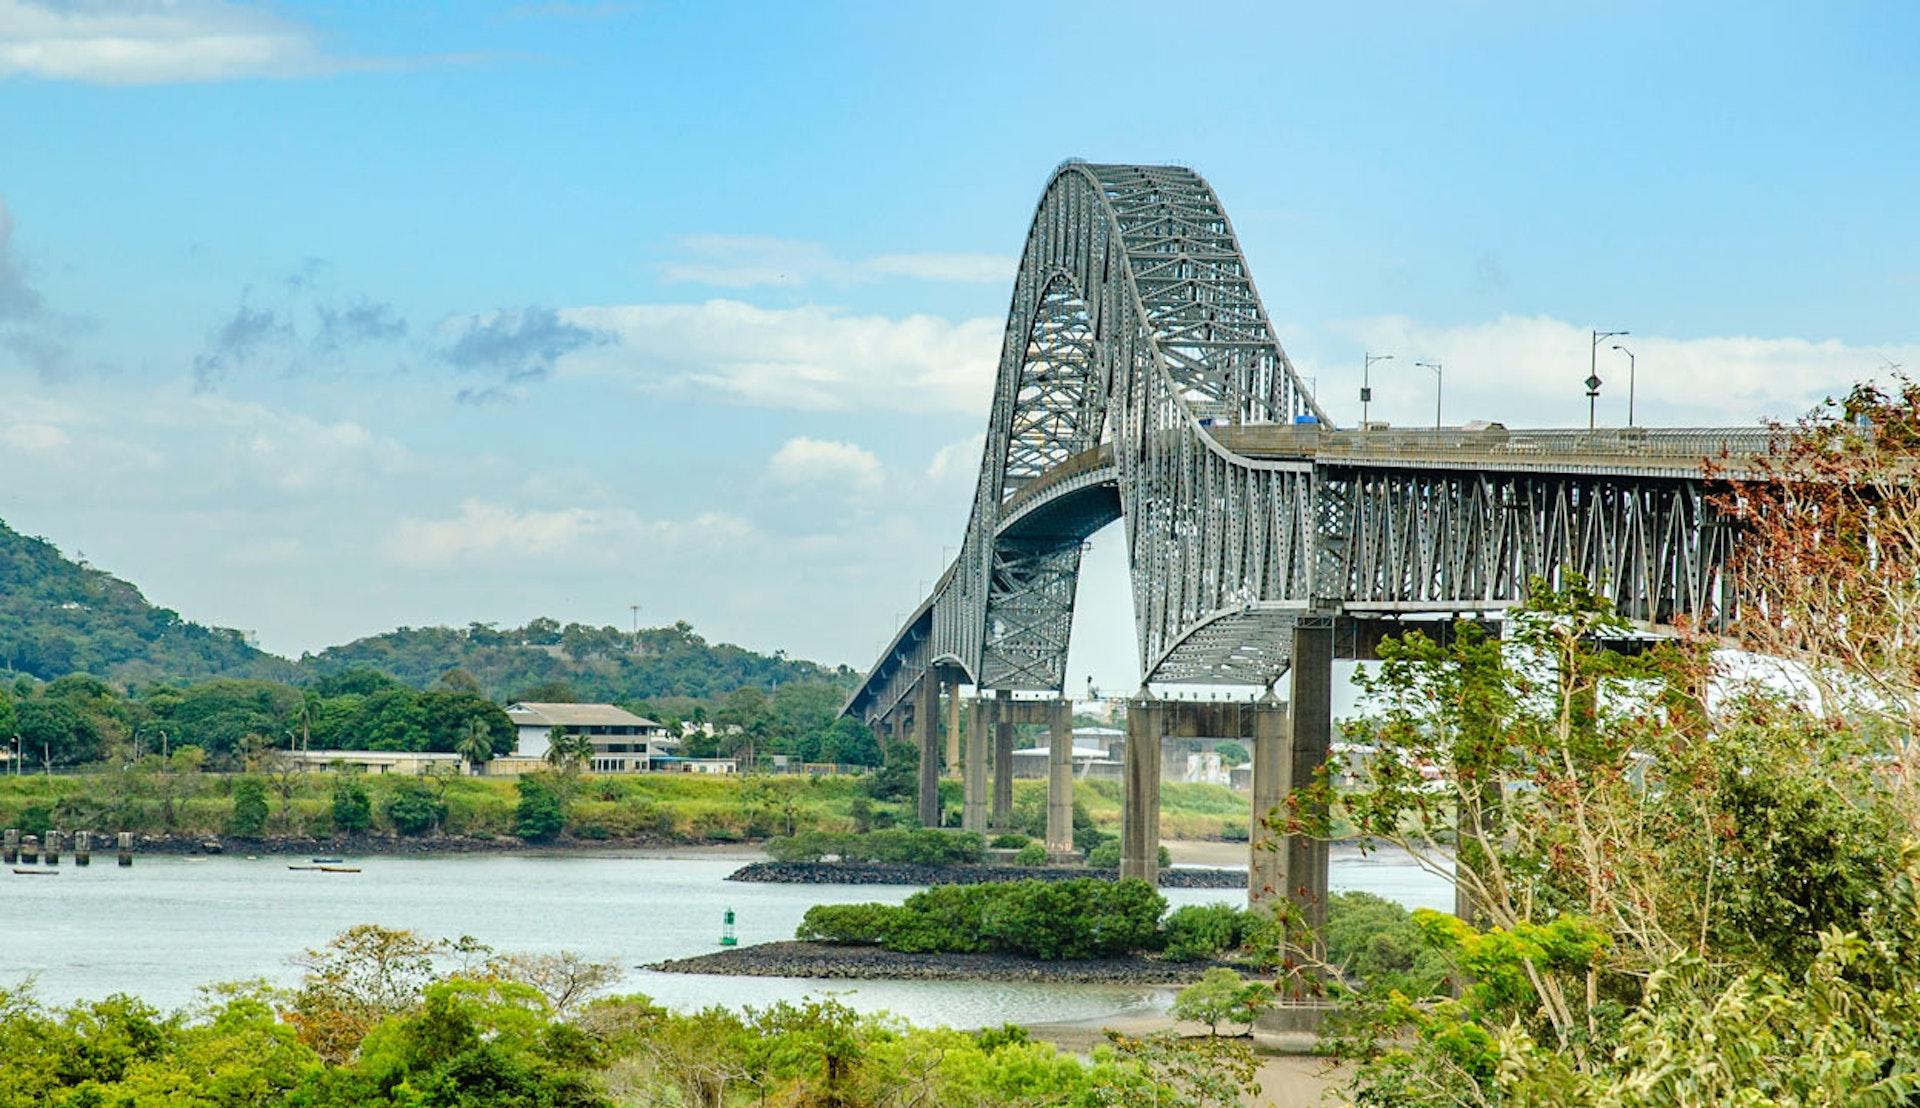 The Bridge of the Americas, vid Panamakanalens mynning i Stilla havet.